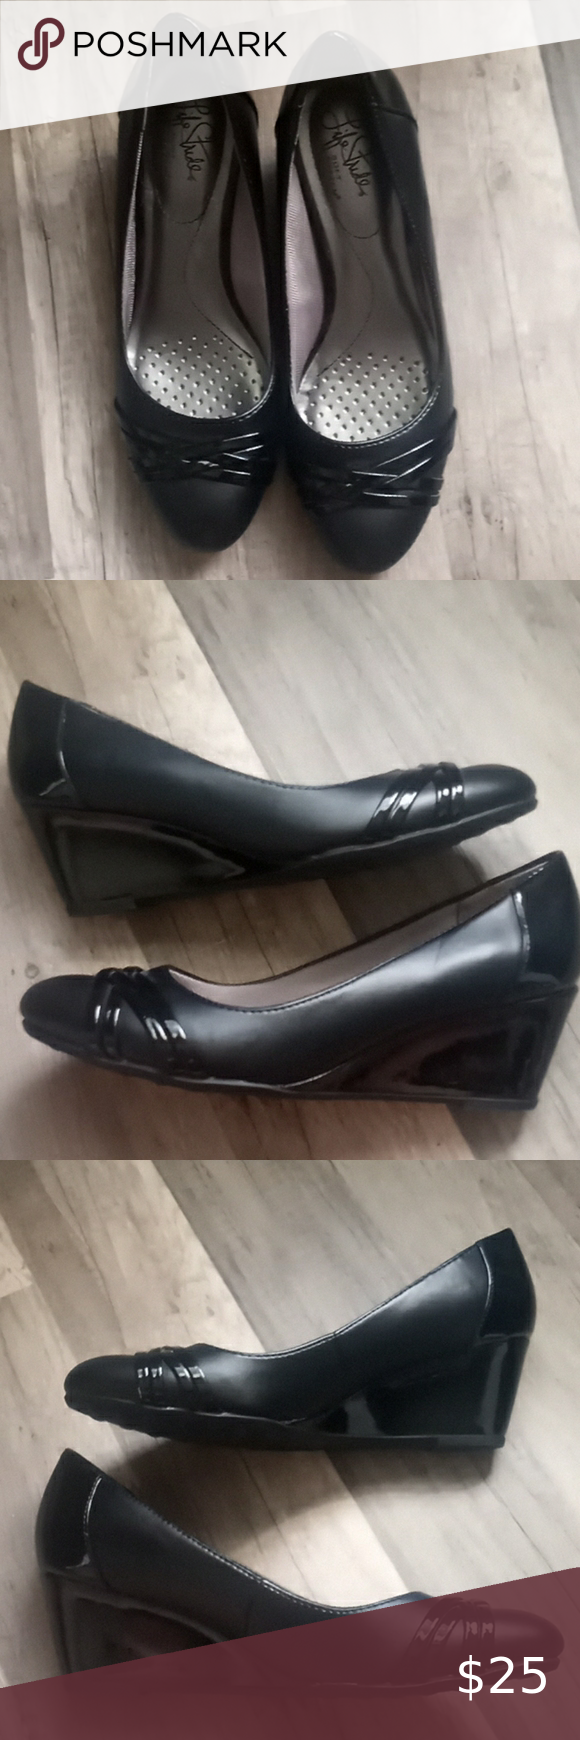 Life Stride Comfort Black Dress Wedges Dress Wedges Womens Shoes Wedges Stride [ 1740 x 580 Pixel ]